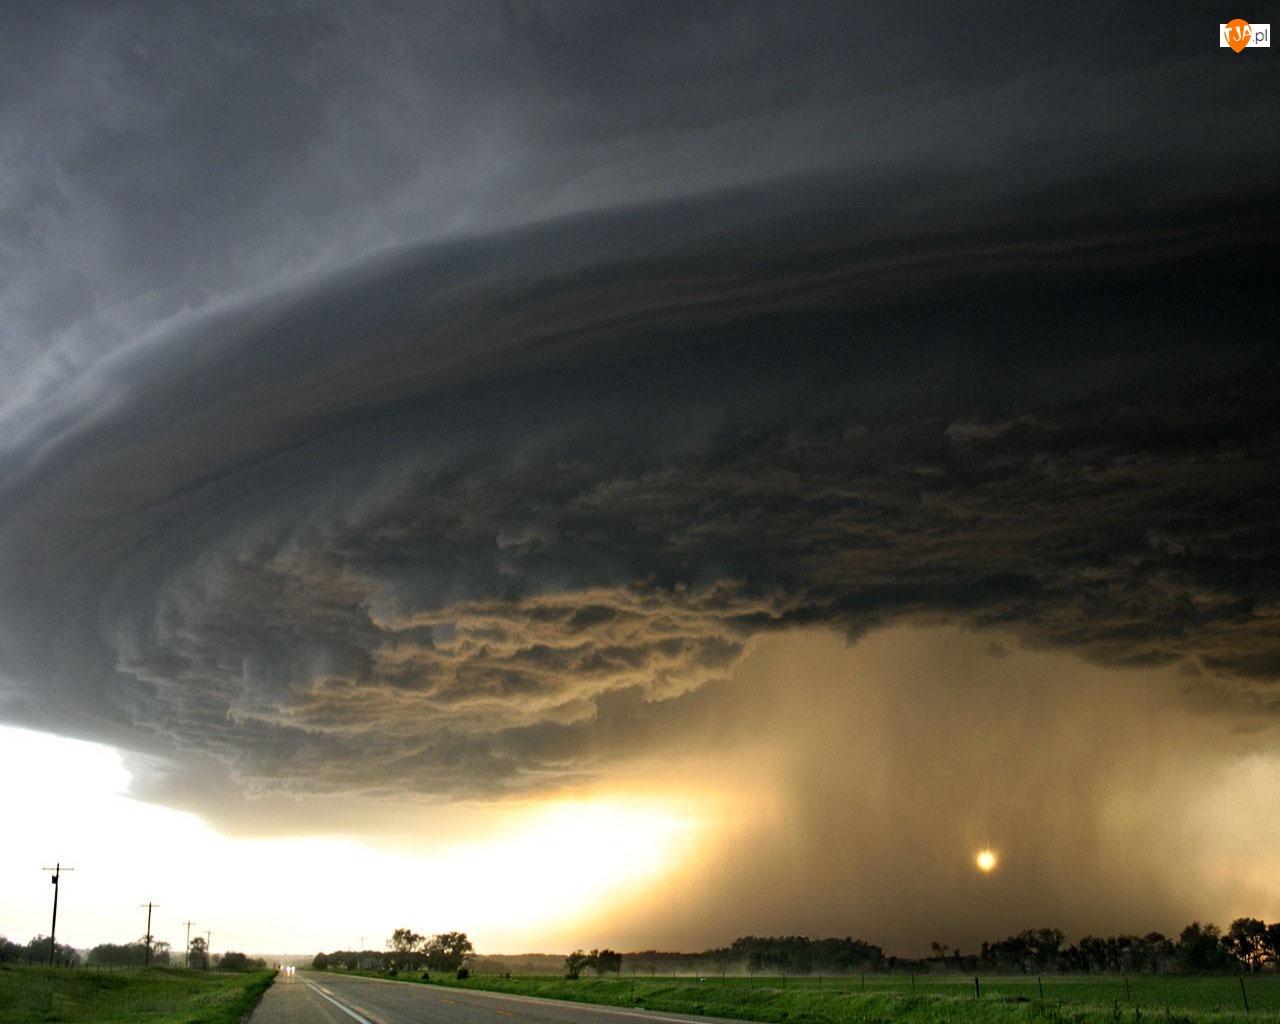 Burza, Tornado, Ulewa, Chmury